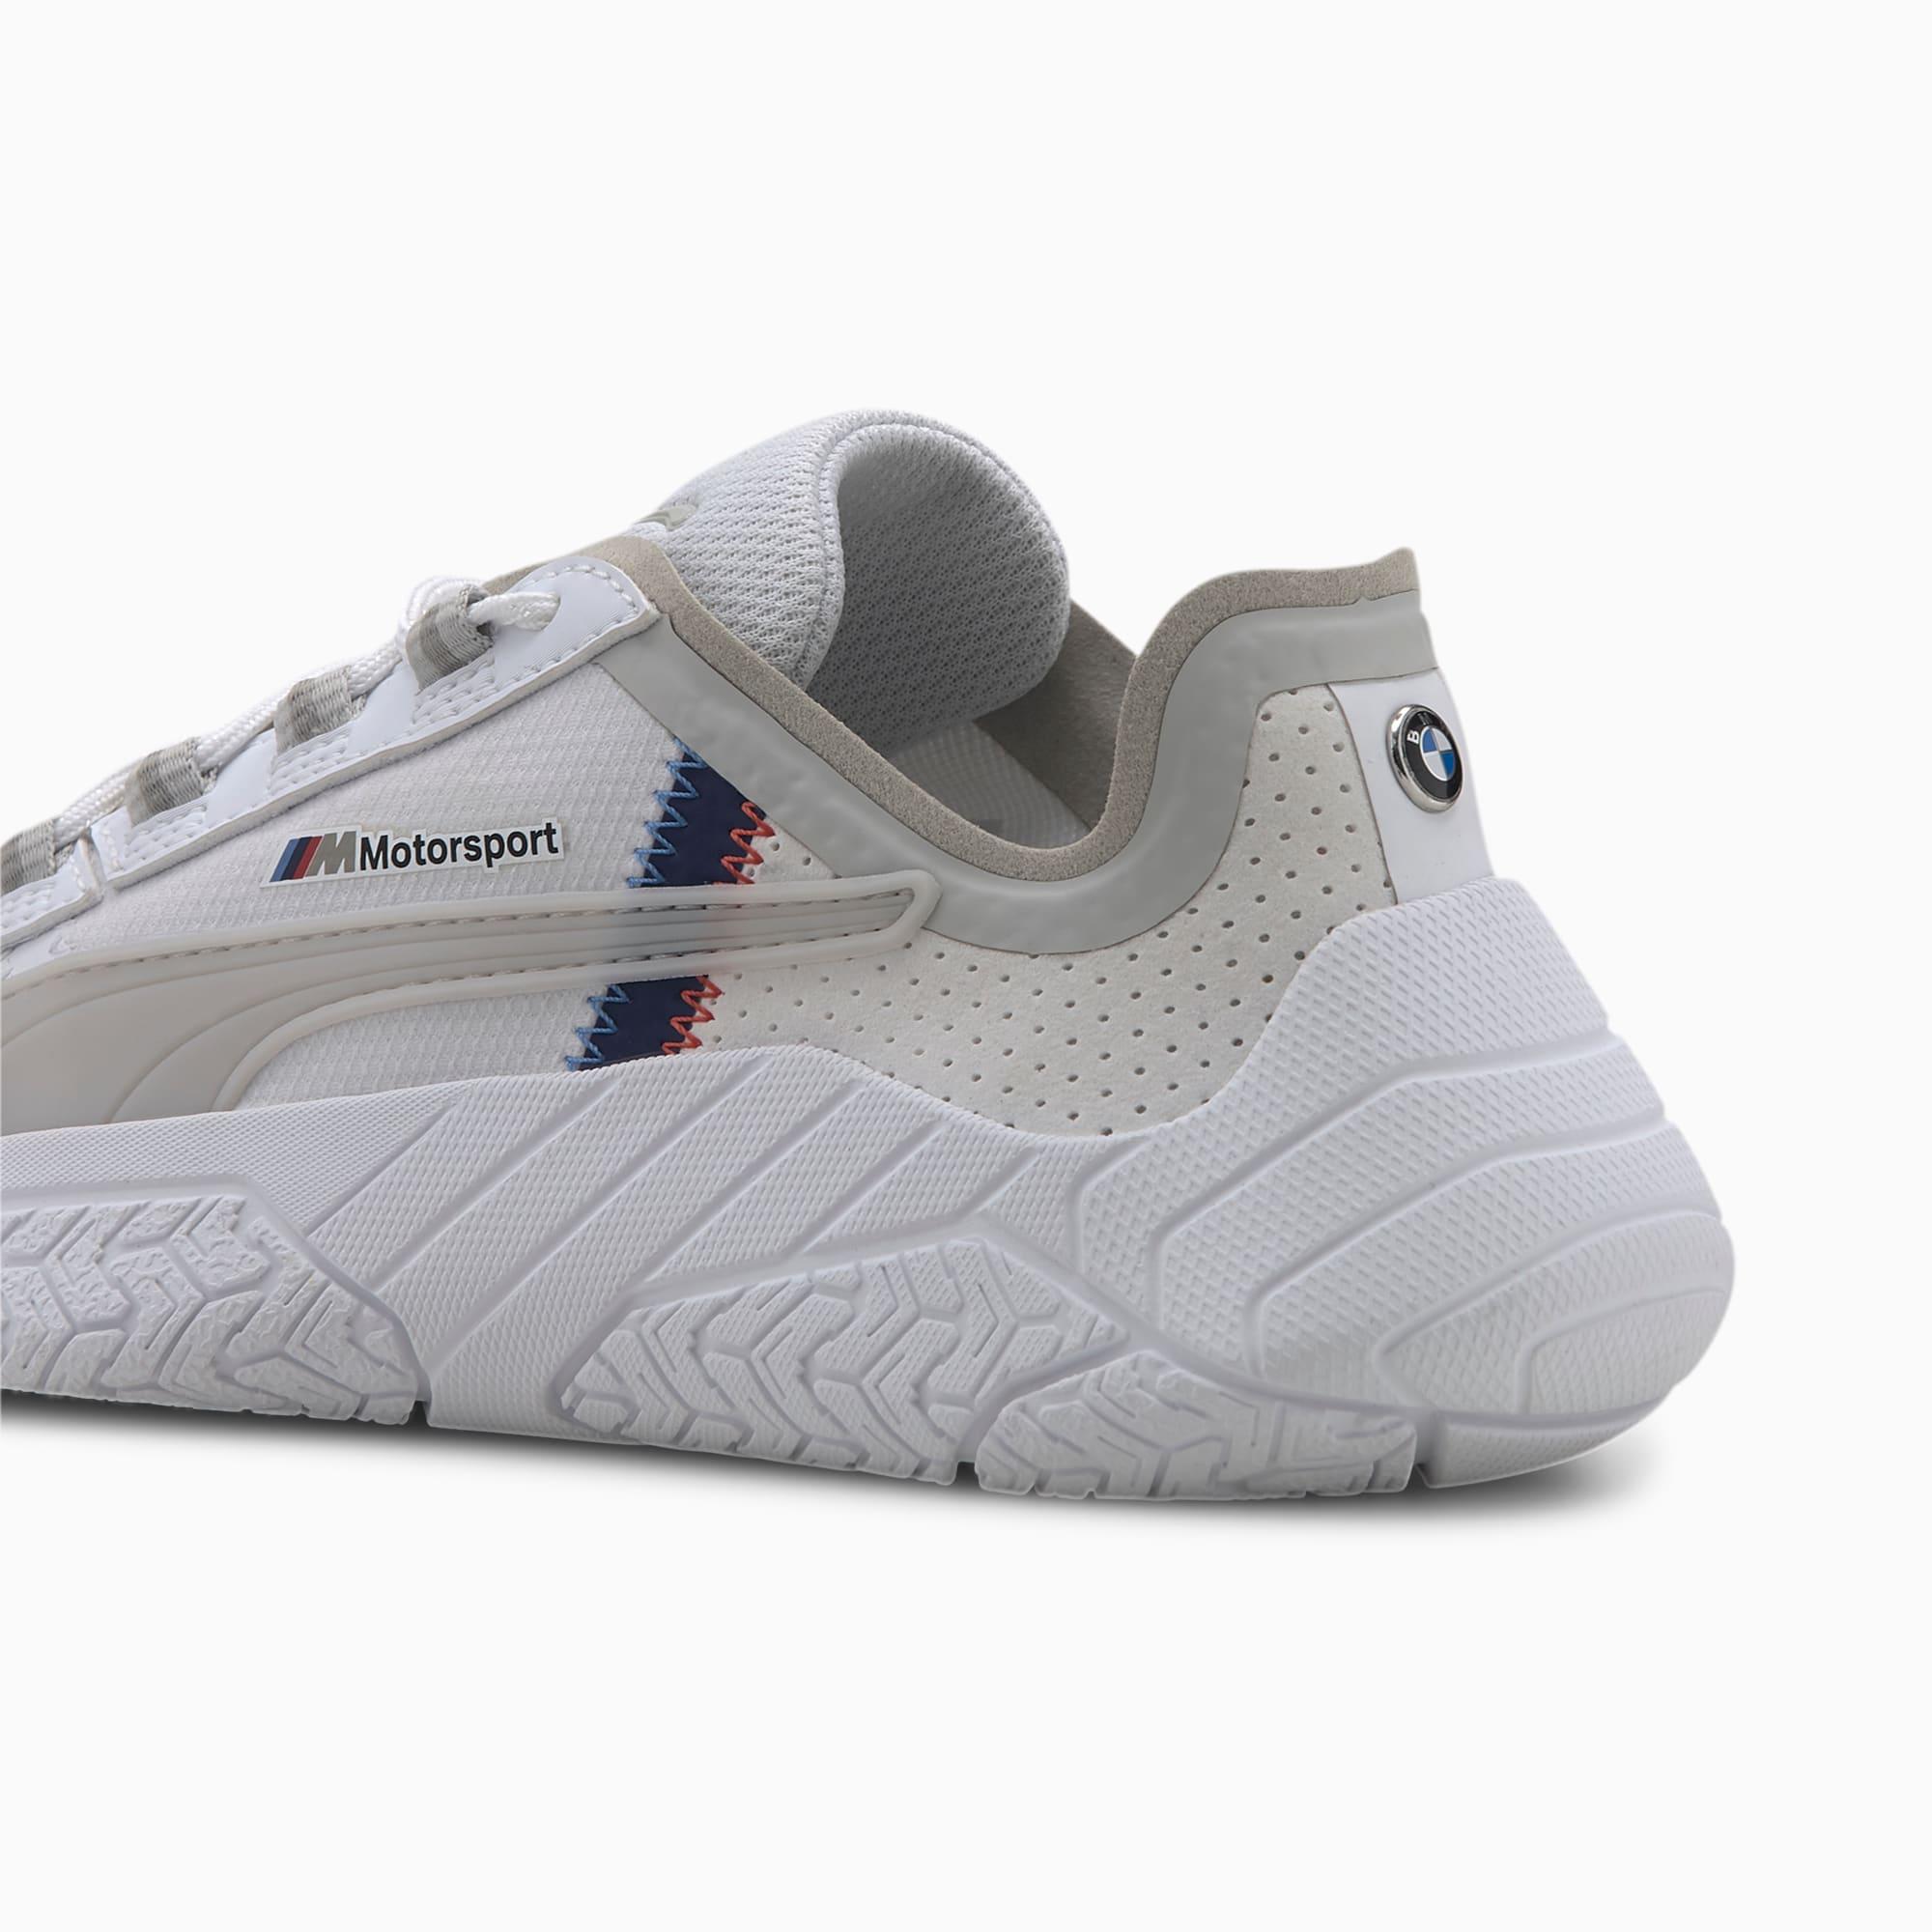 BMW M Motorsport Replicat X Motorsport Shoes JR